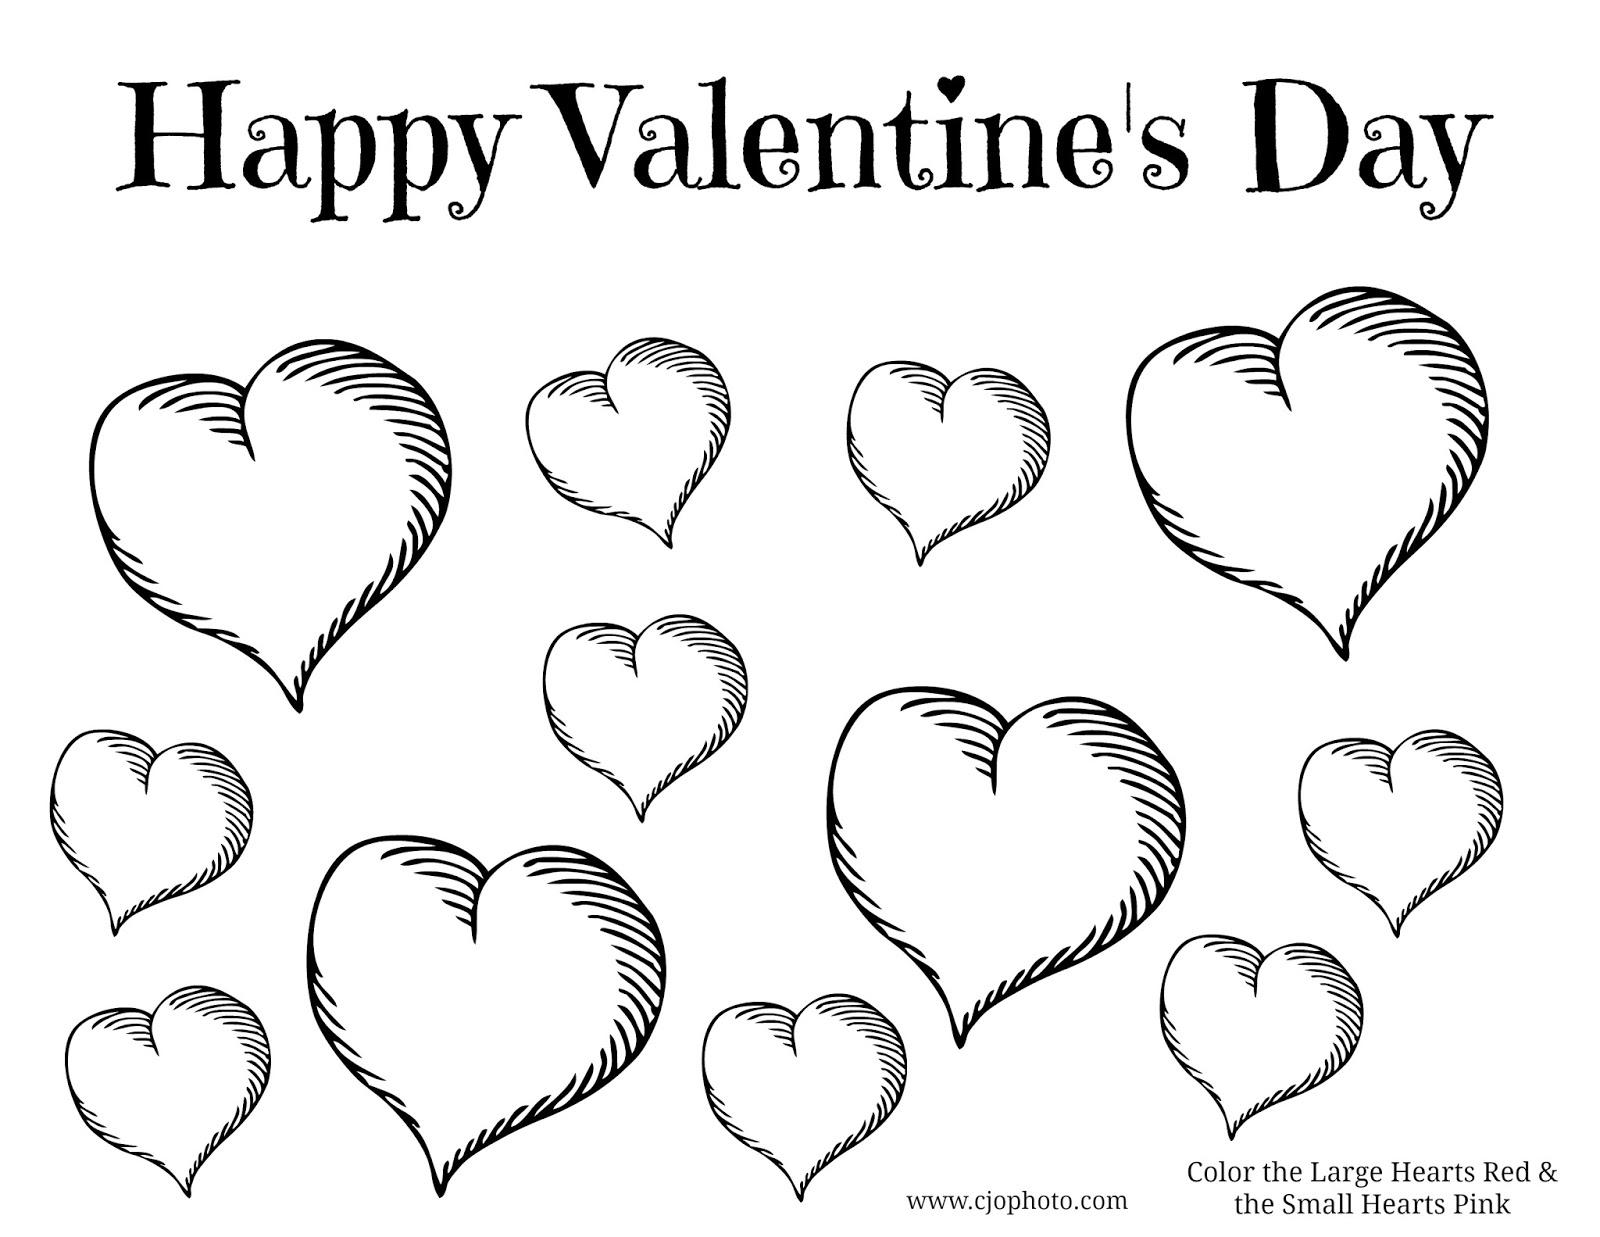 CJO Photo Valentine's Day Coloring Page Valentine's Day Hearts